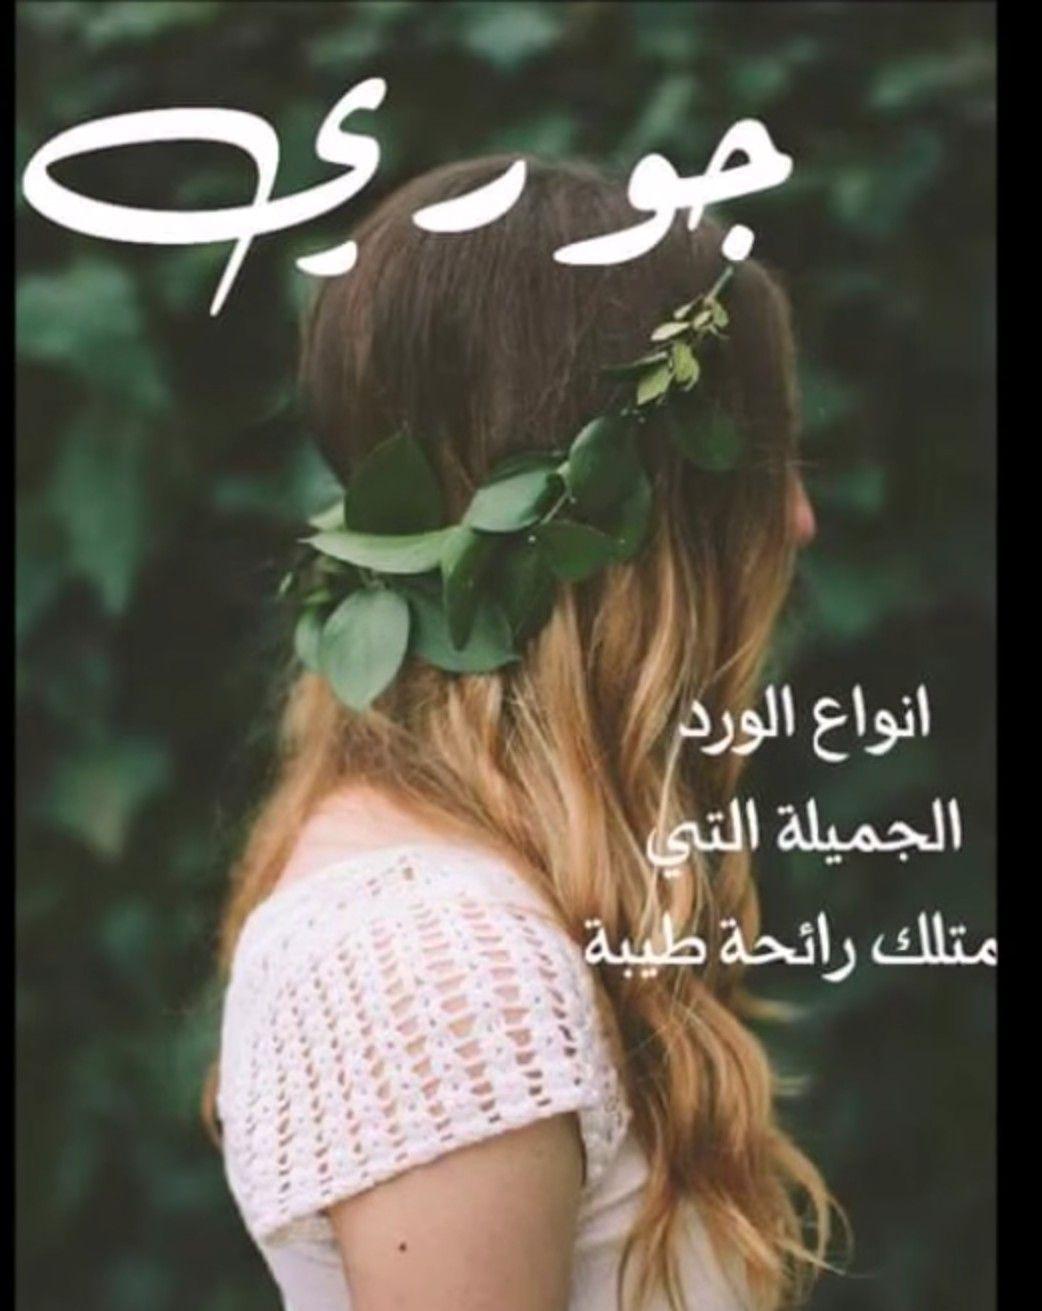 Pin By فلسطينية ولي الفخر ريم الفل On حروف أسماء واشكال مزخرفة Headbands Fashion Ord